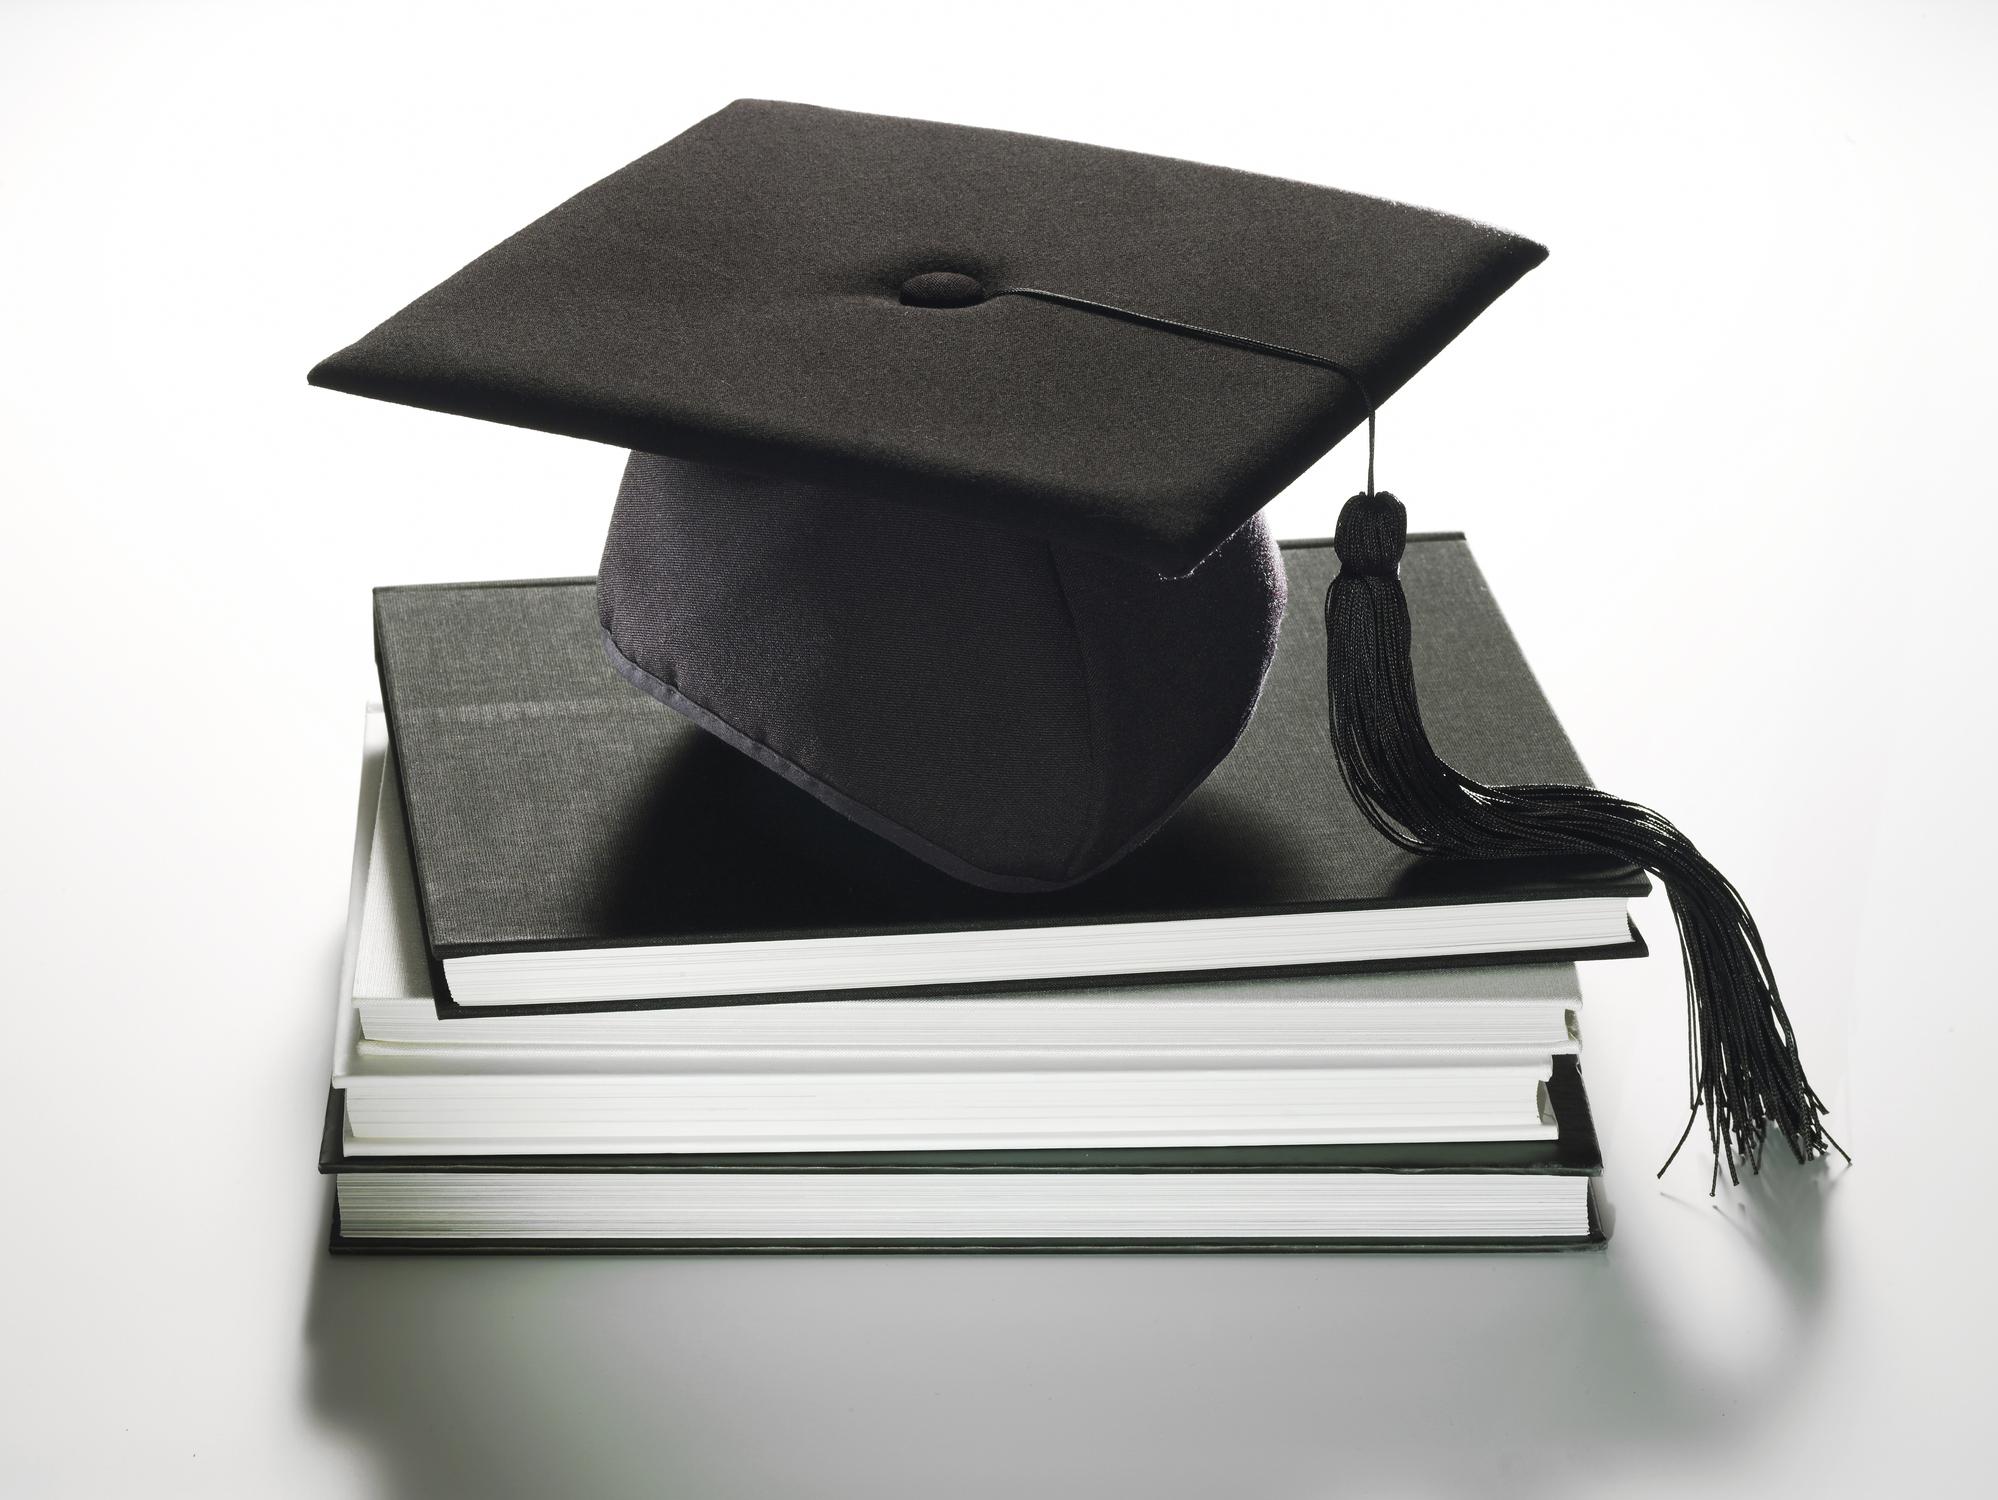 graduation ceremony ideas - Digital Yearbook